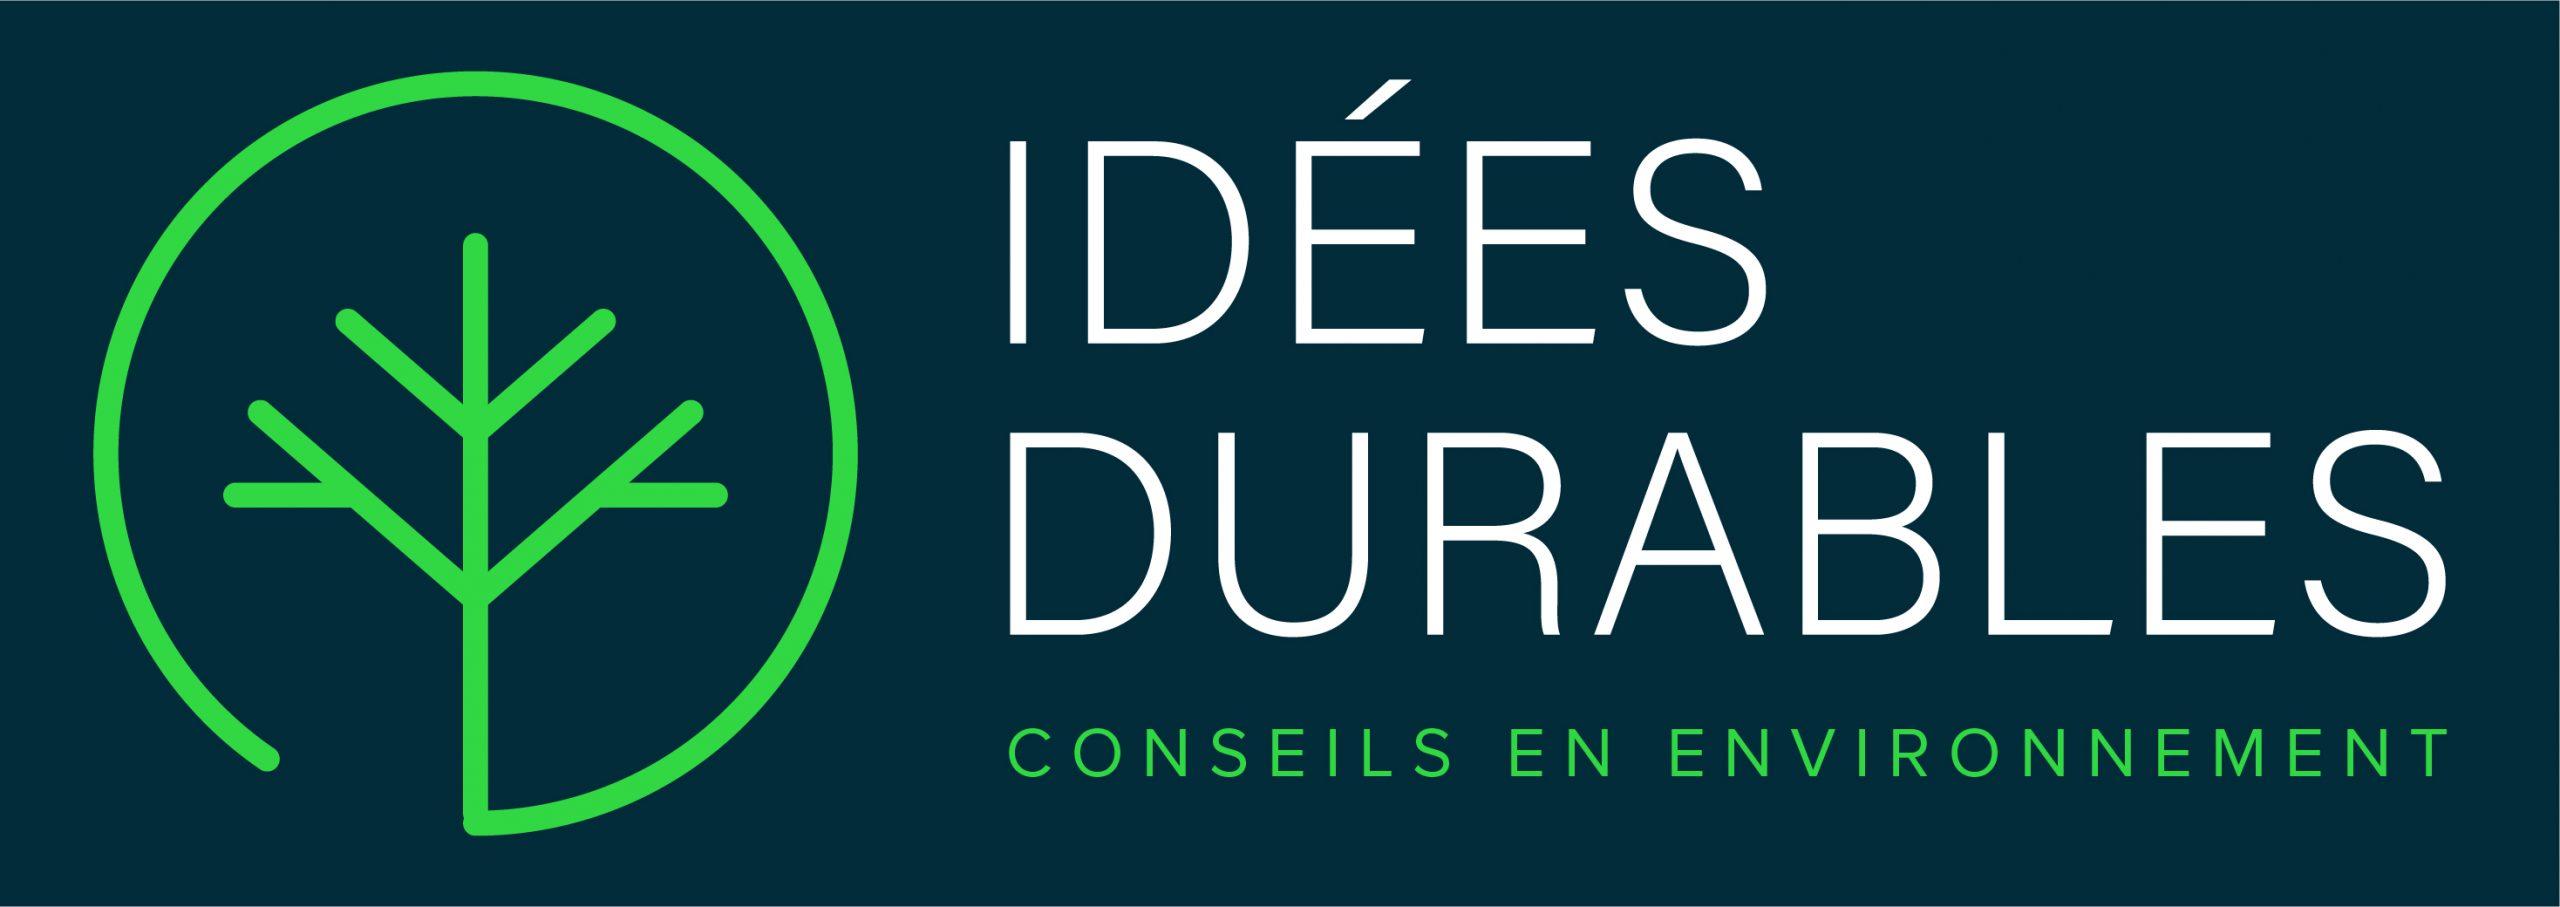 ideedurable_logofull_color_dark